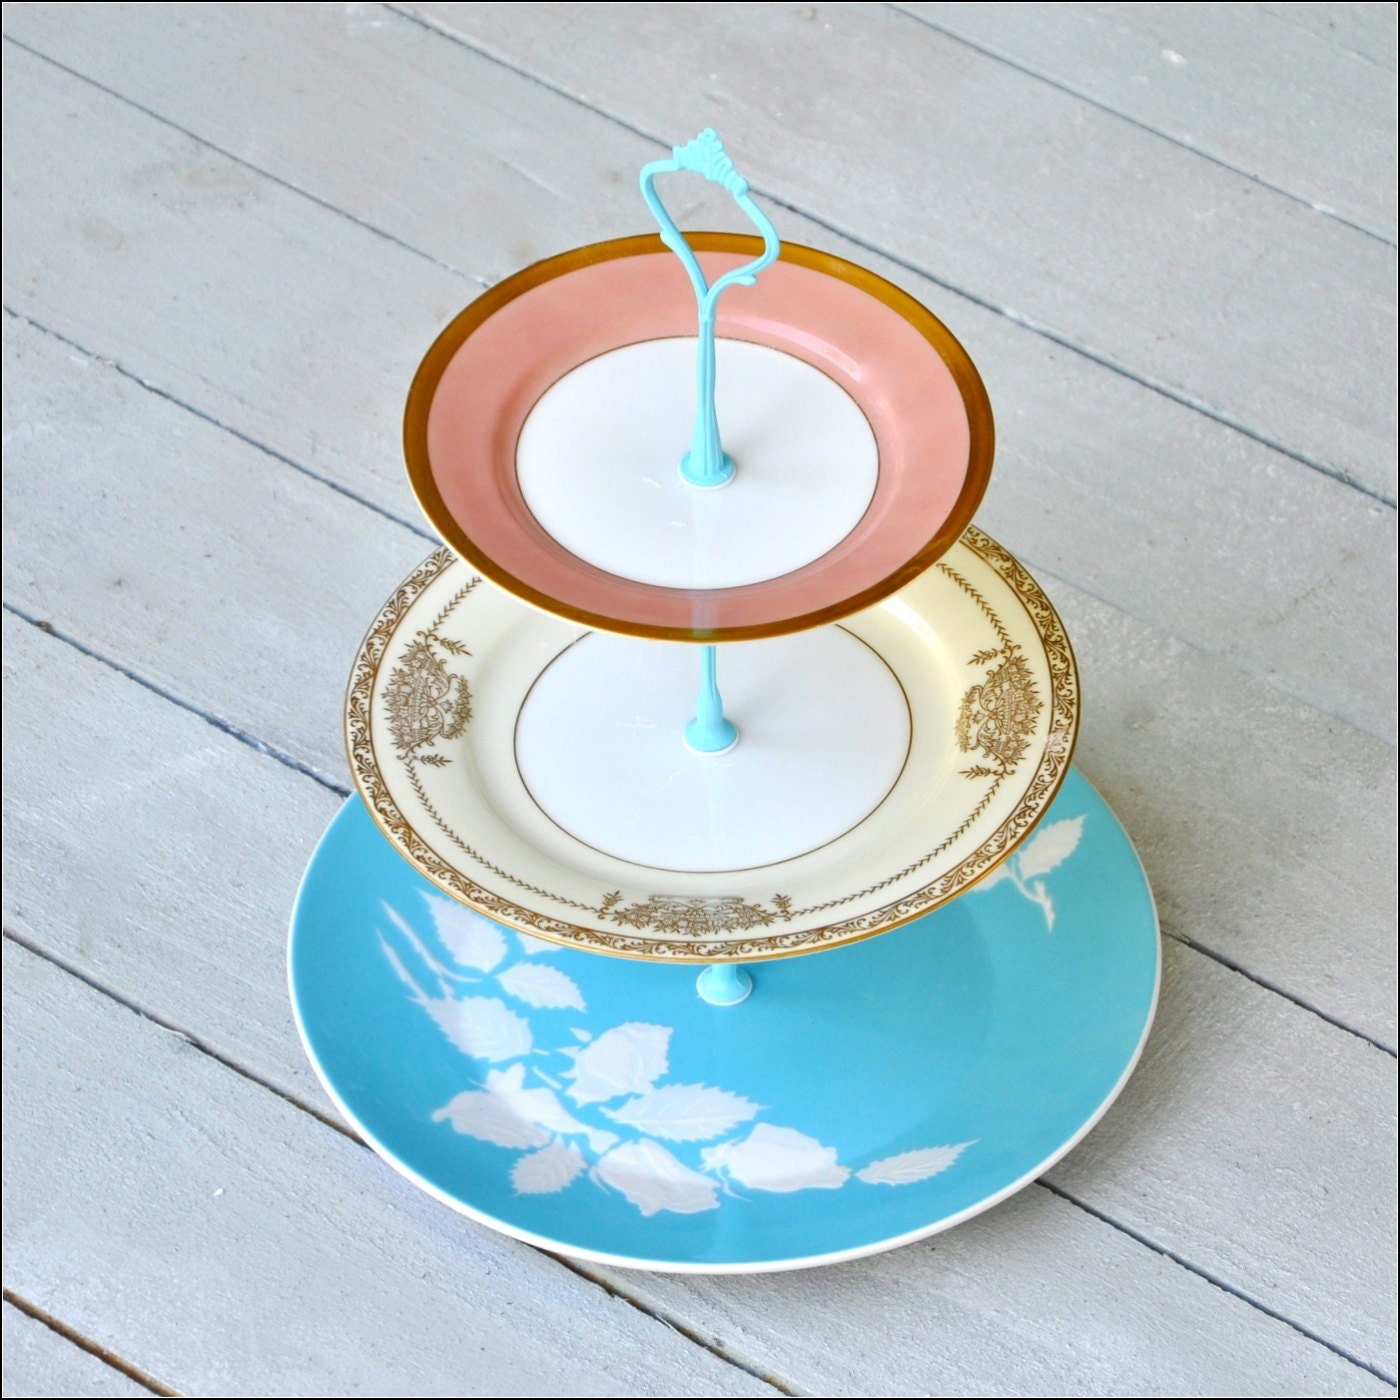 chrysalis 3 tier cake stand vintage cake stand mid century. Black Bedroom Furniture Sets. Home Design Ideas